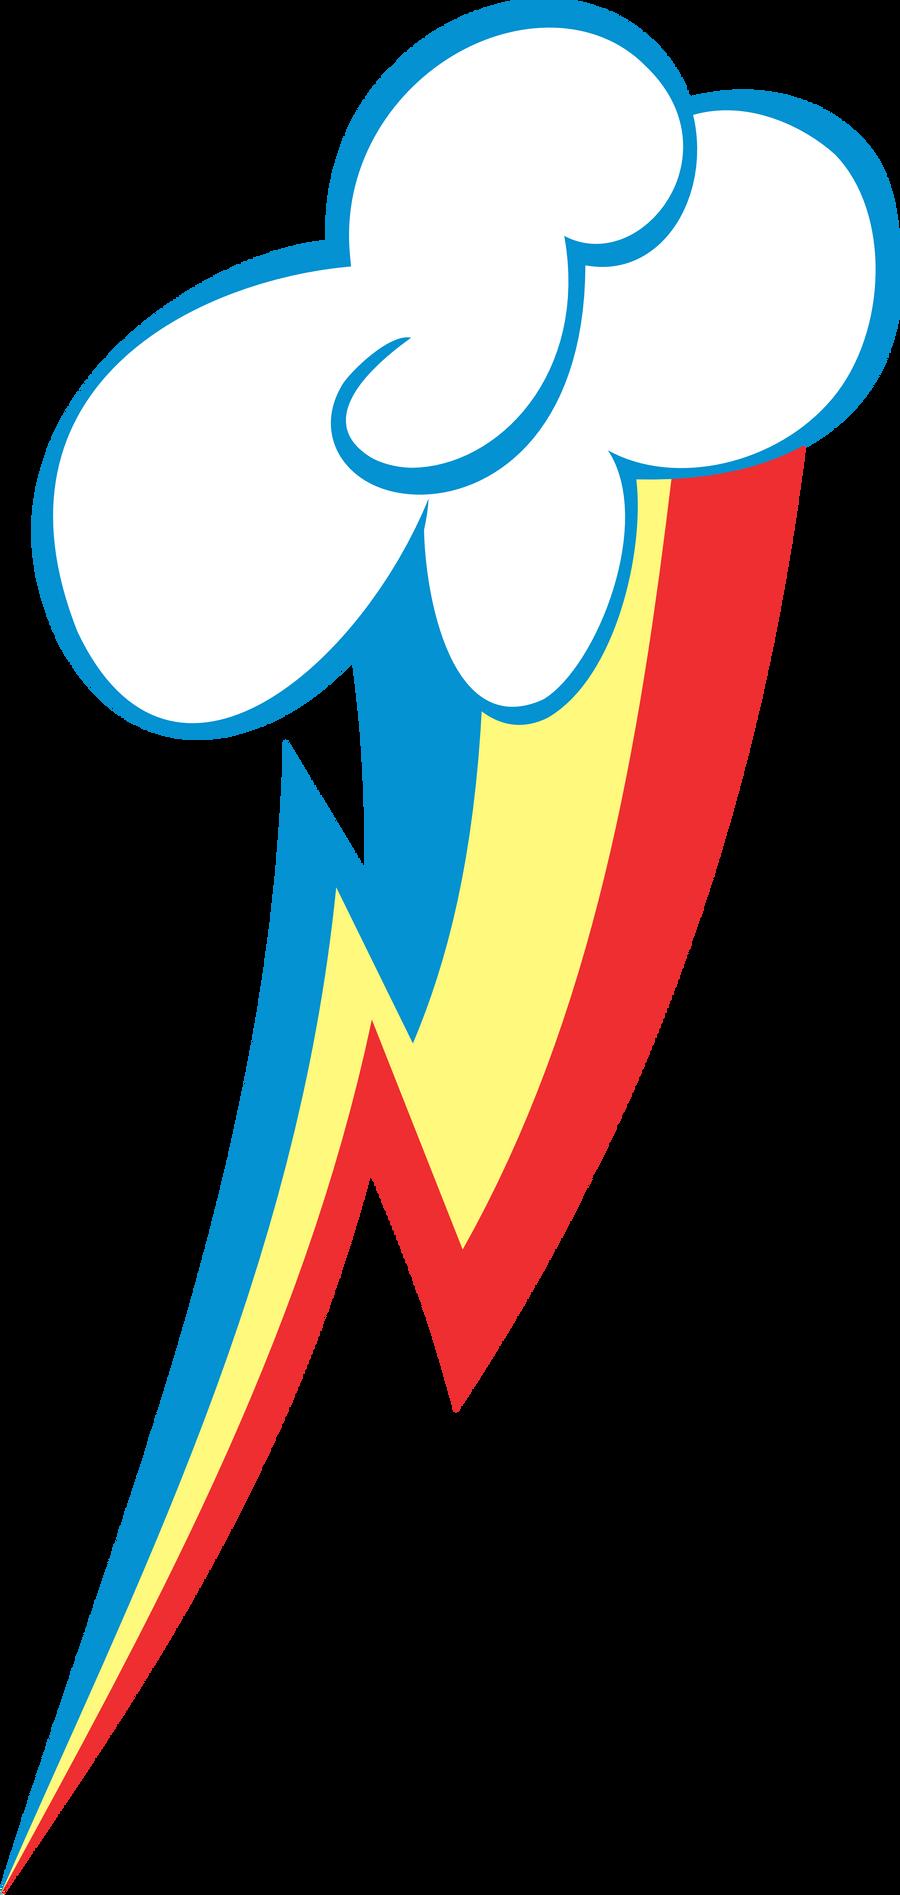 Rainbow Dash Cutie Mark by uxyd on DeviantArt